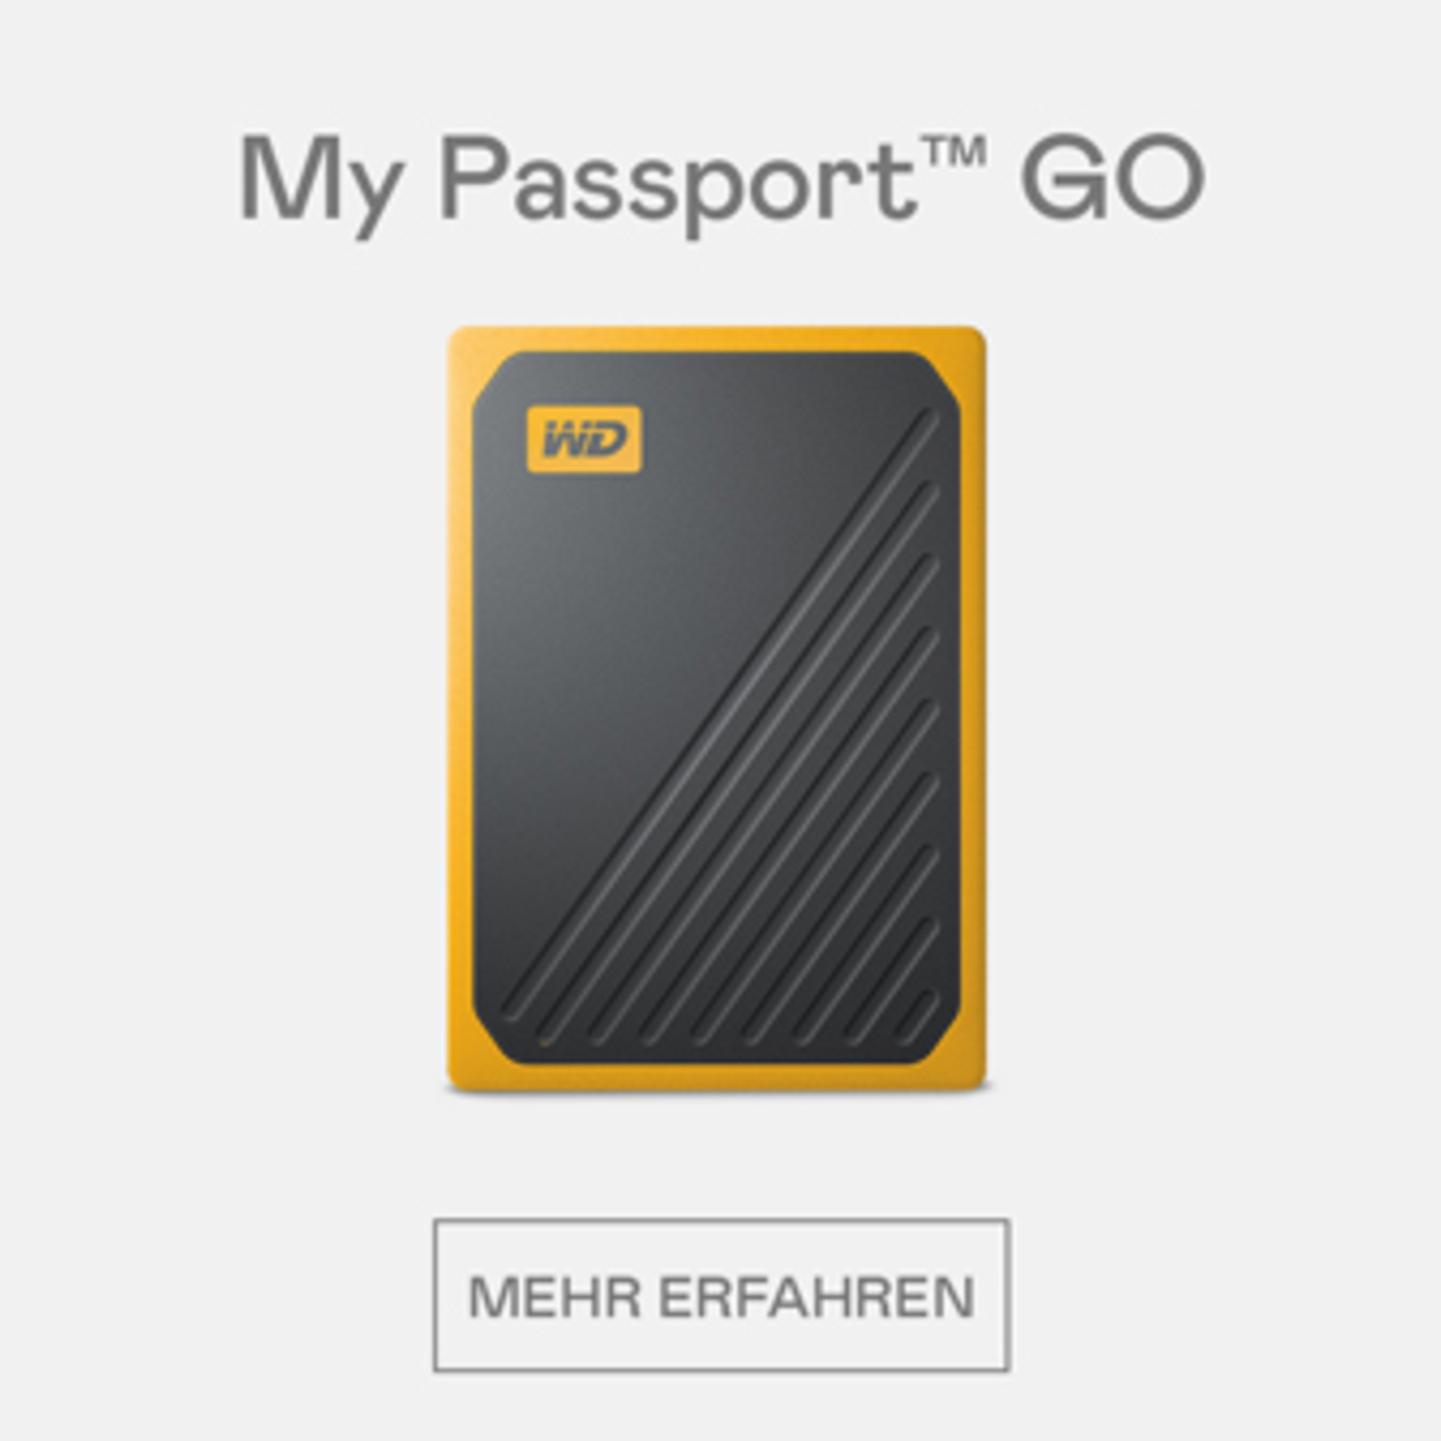 My Passport Go